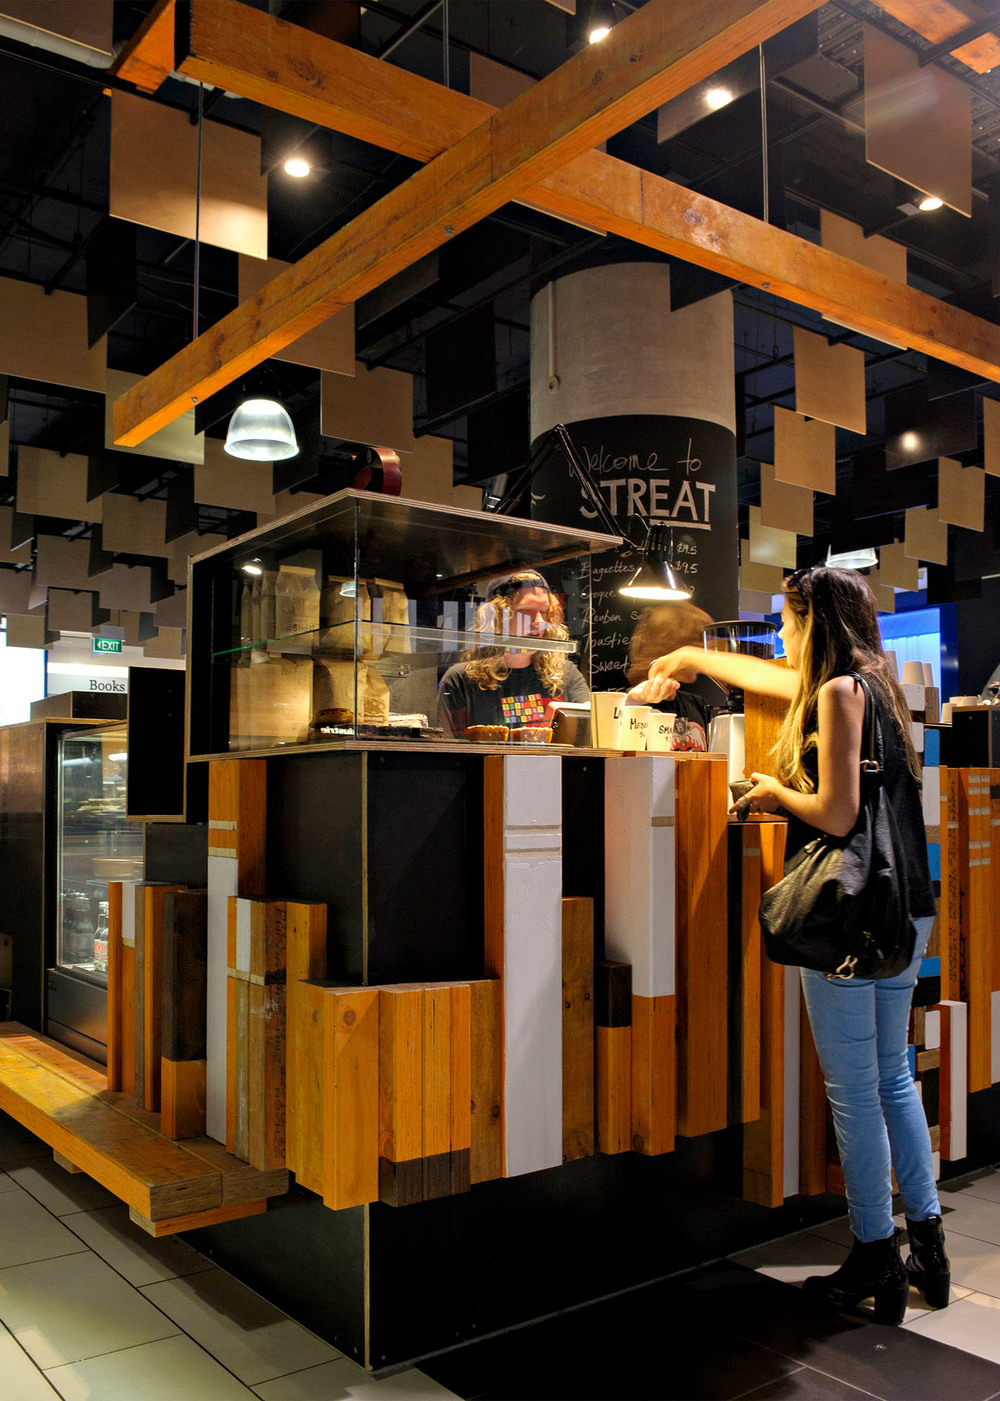 Streat Cafe